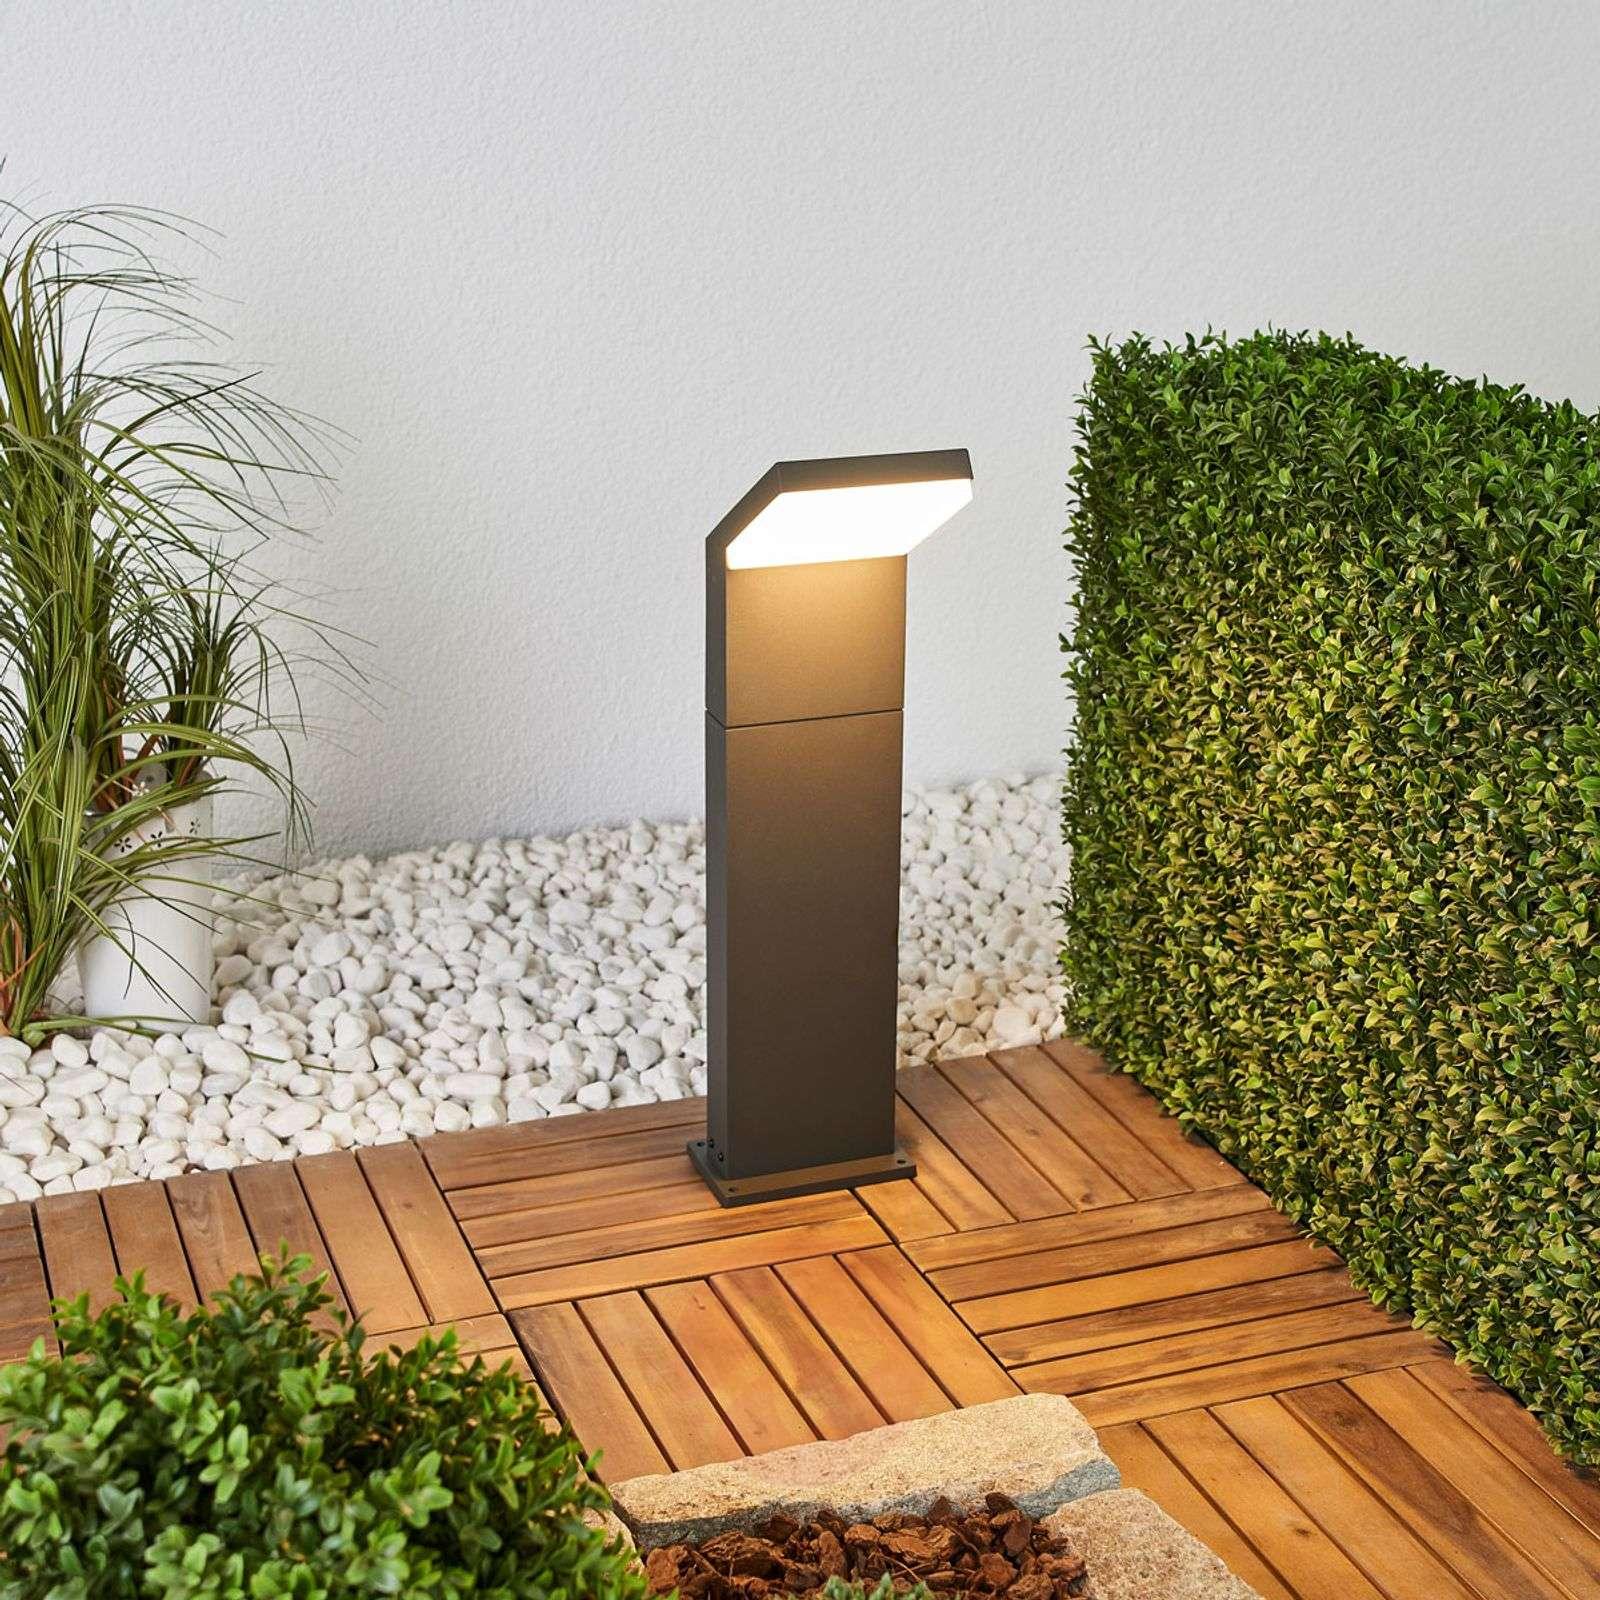 Grafiitinharmaa LED-pylväsvalaisin Yolena, 60 cm-9619119-02